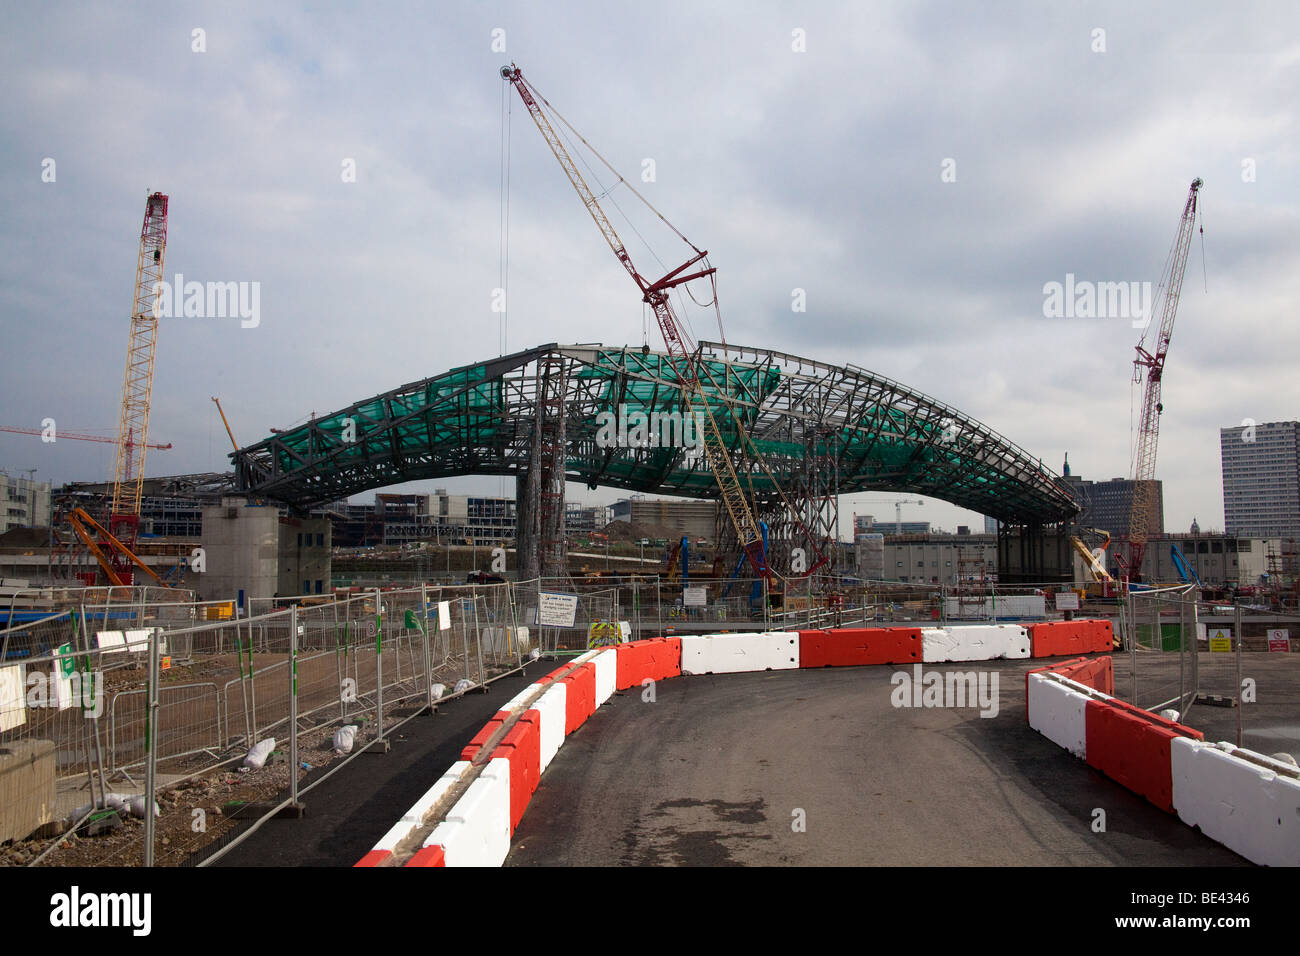 2012 London Olympic Aquatics Centre designed by the award winning architect Zaha Hadid under under construction - Stock Image